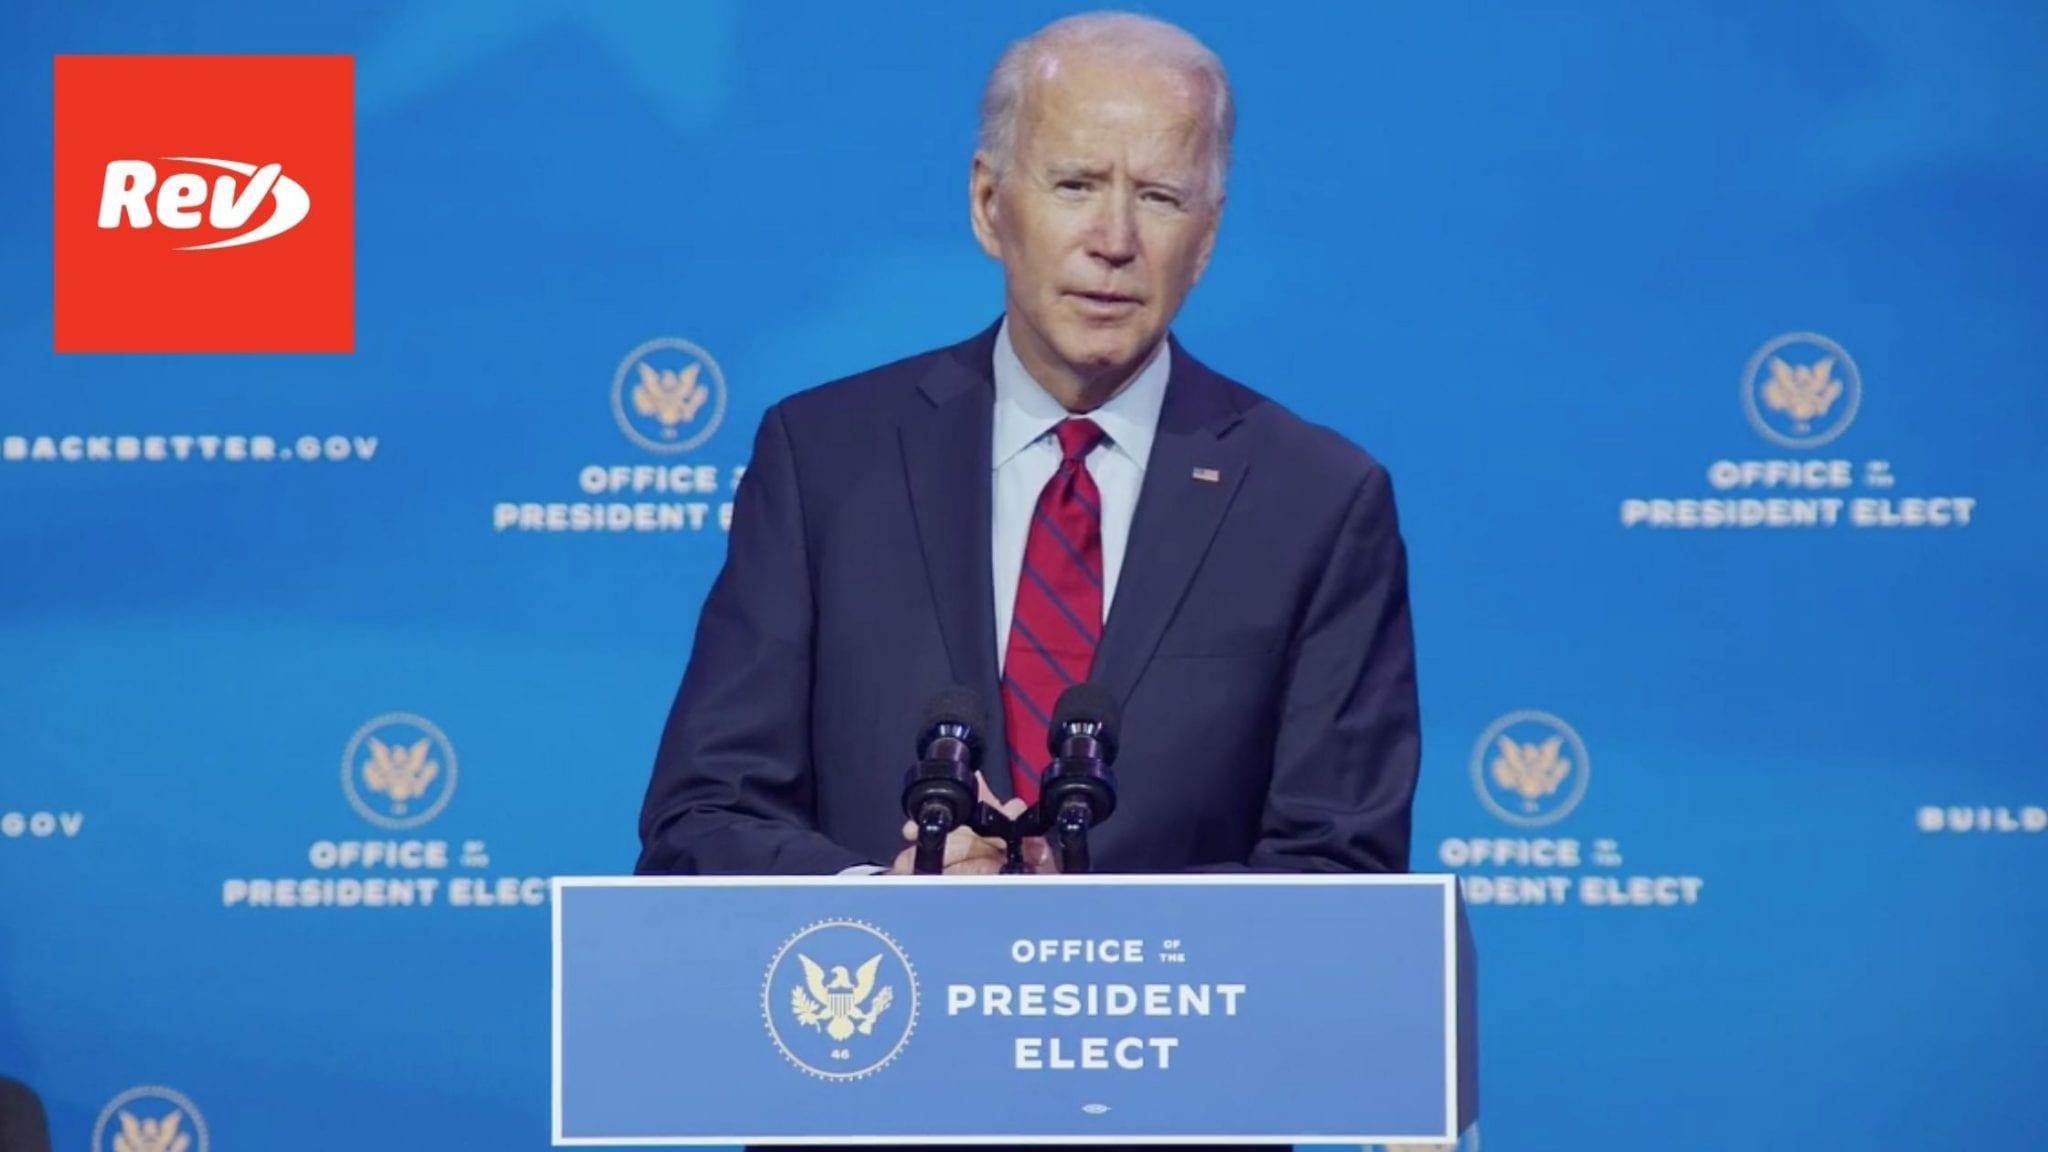 Joe Biden Announces Fauci & Key Health Team Picks Briefing Transcript December 8